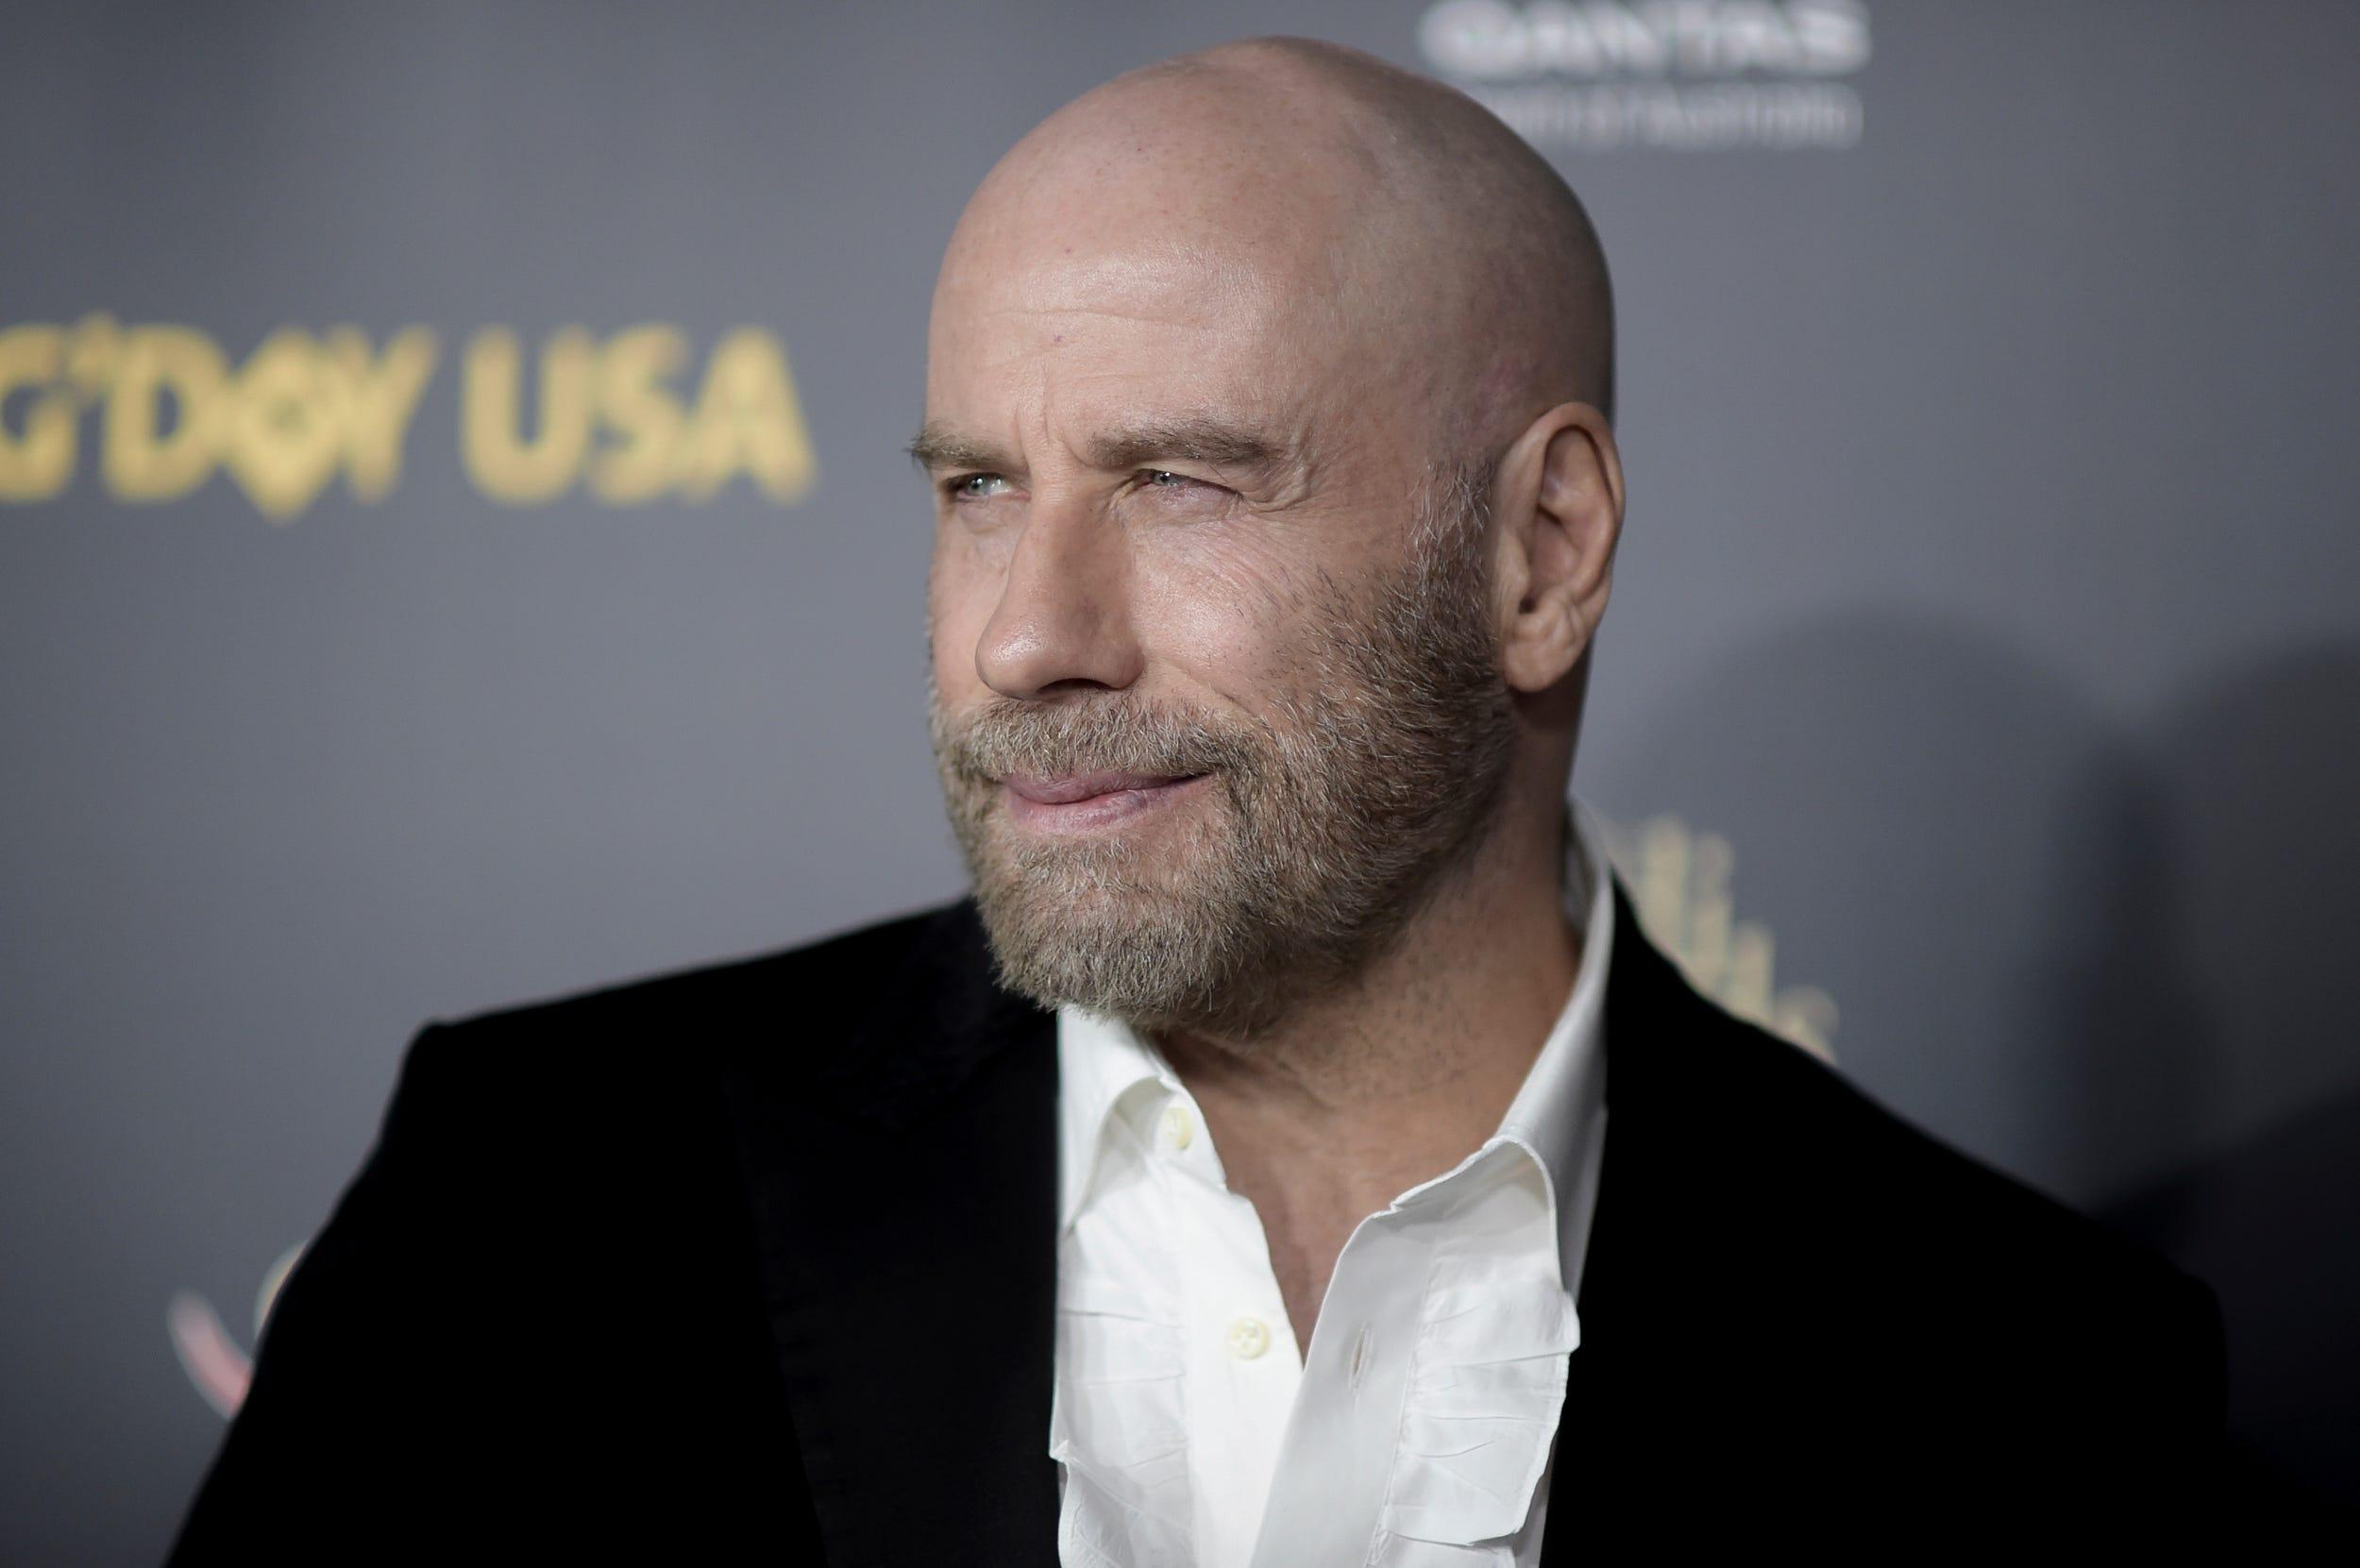 John Travolta says his bald look is his biggest news since Oscar flub, credits Pitbull